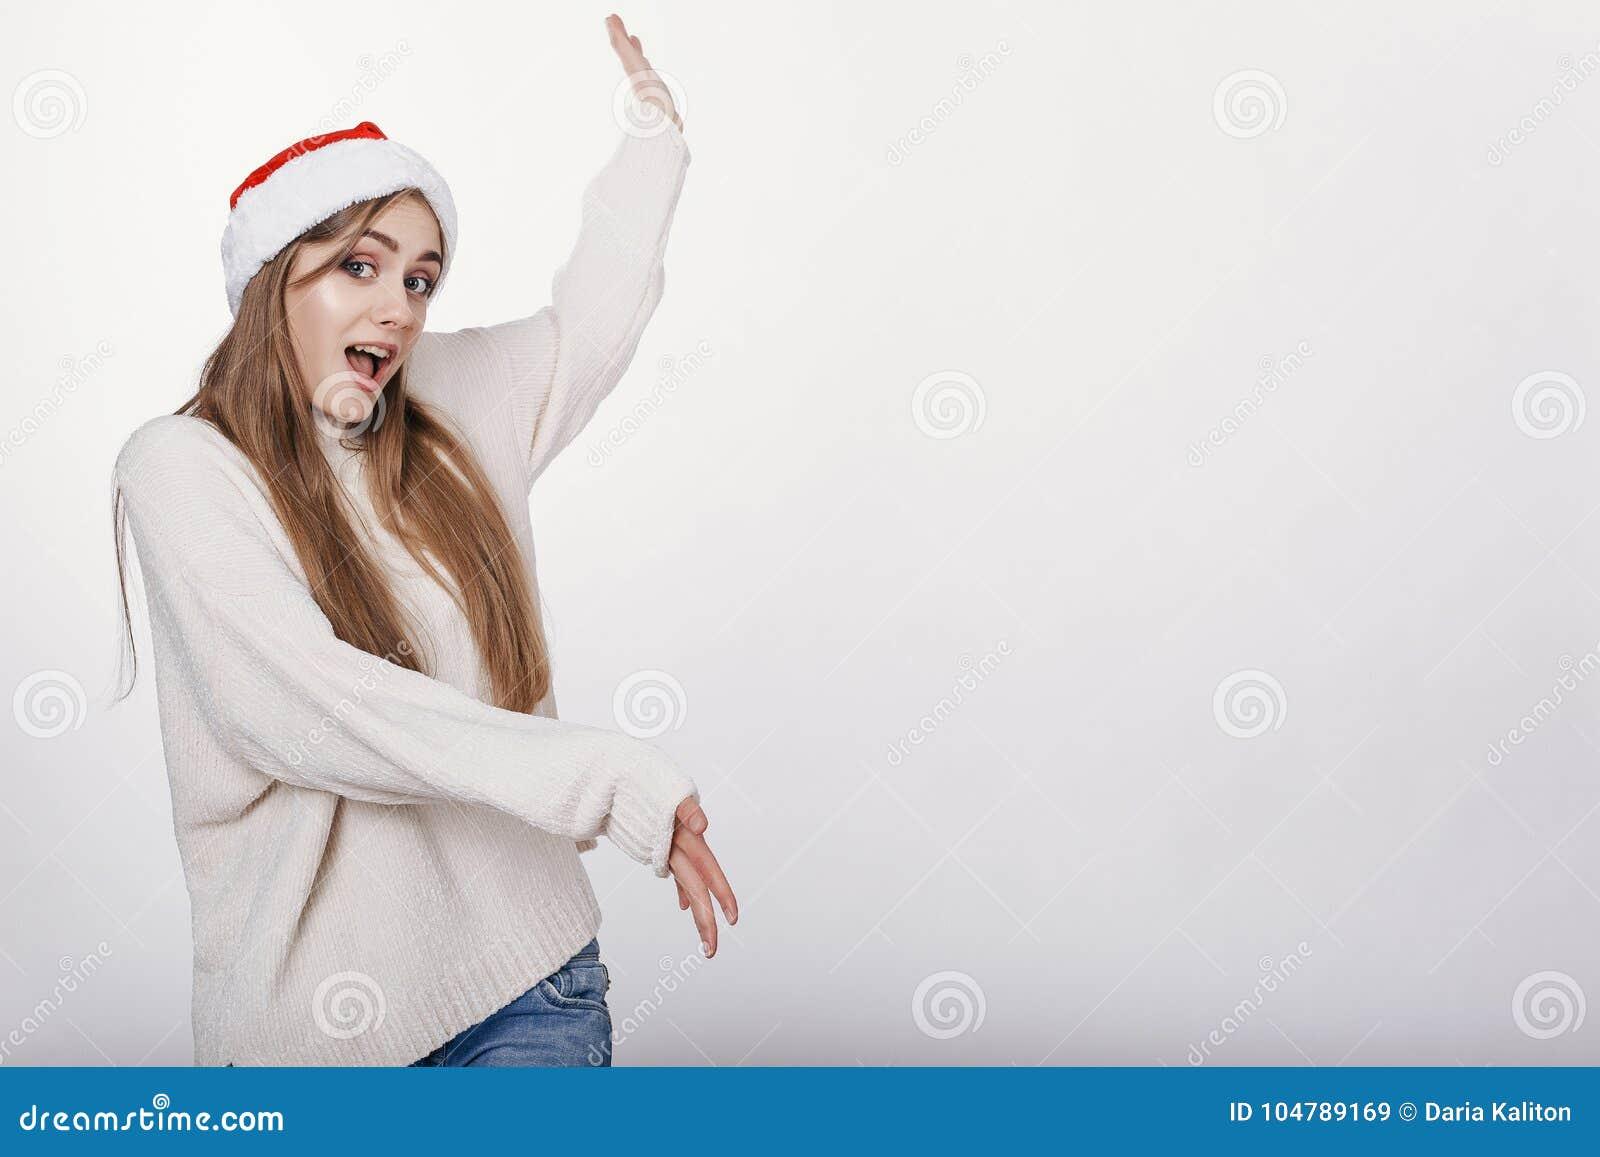 Woman in santa hat pointing on something big